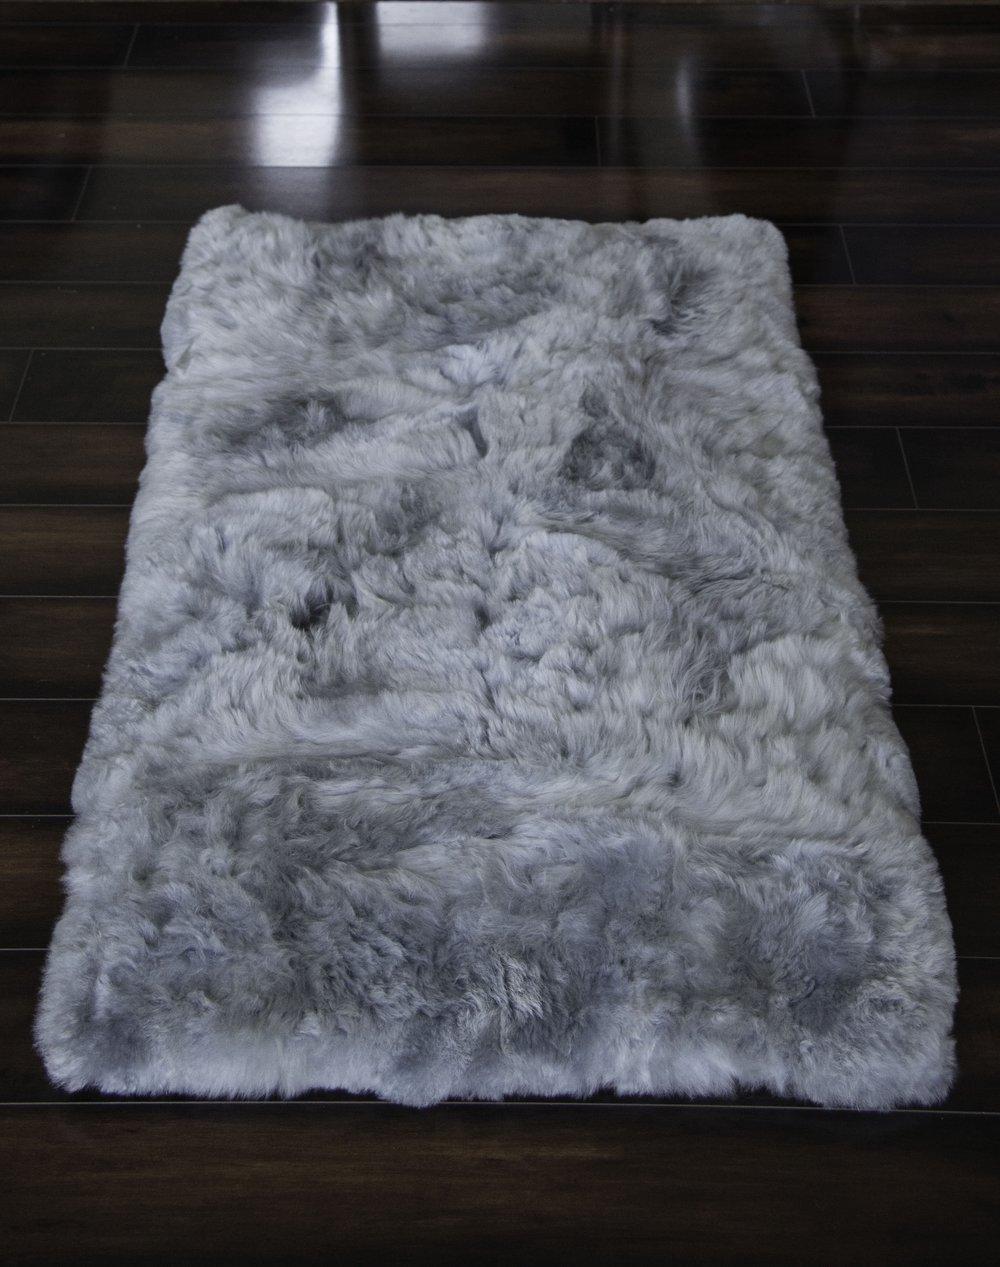 Hua Alpaca rug, fur rug in Light Gray